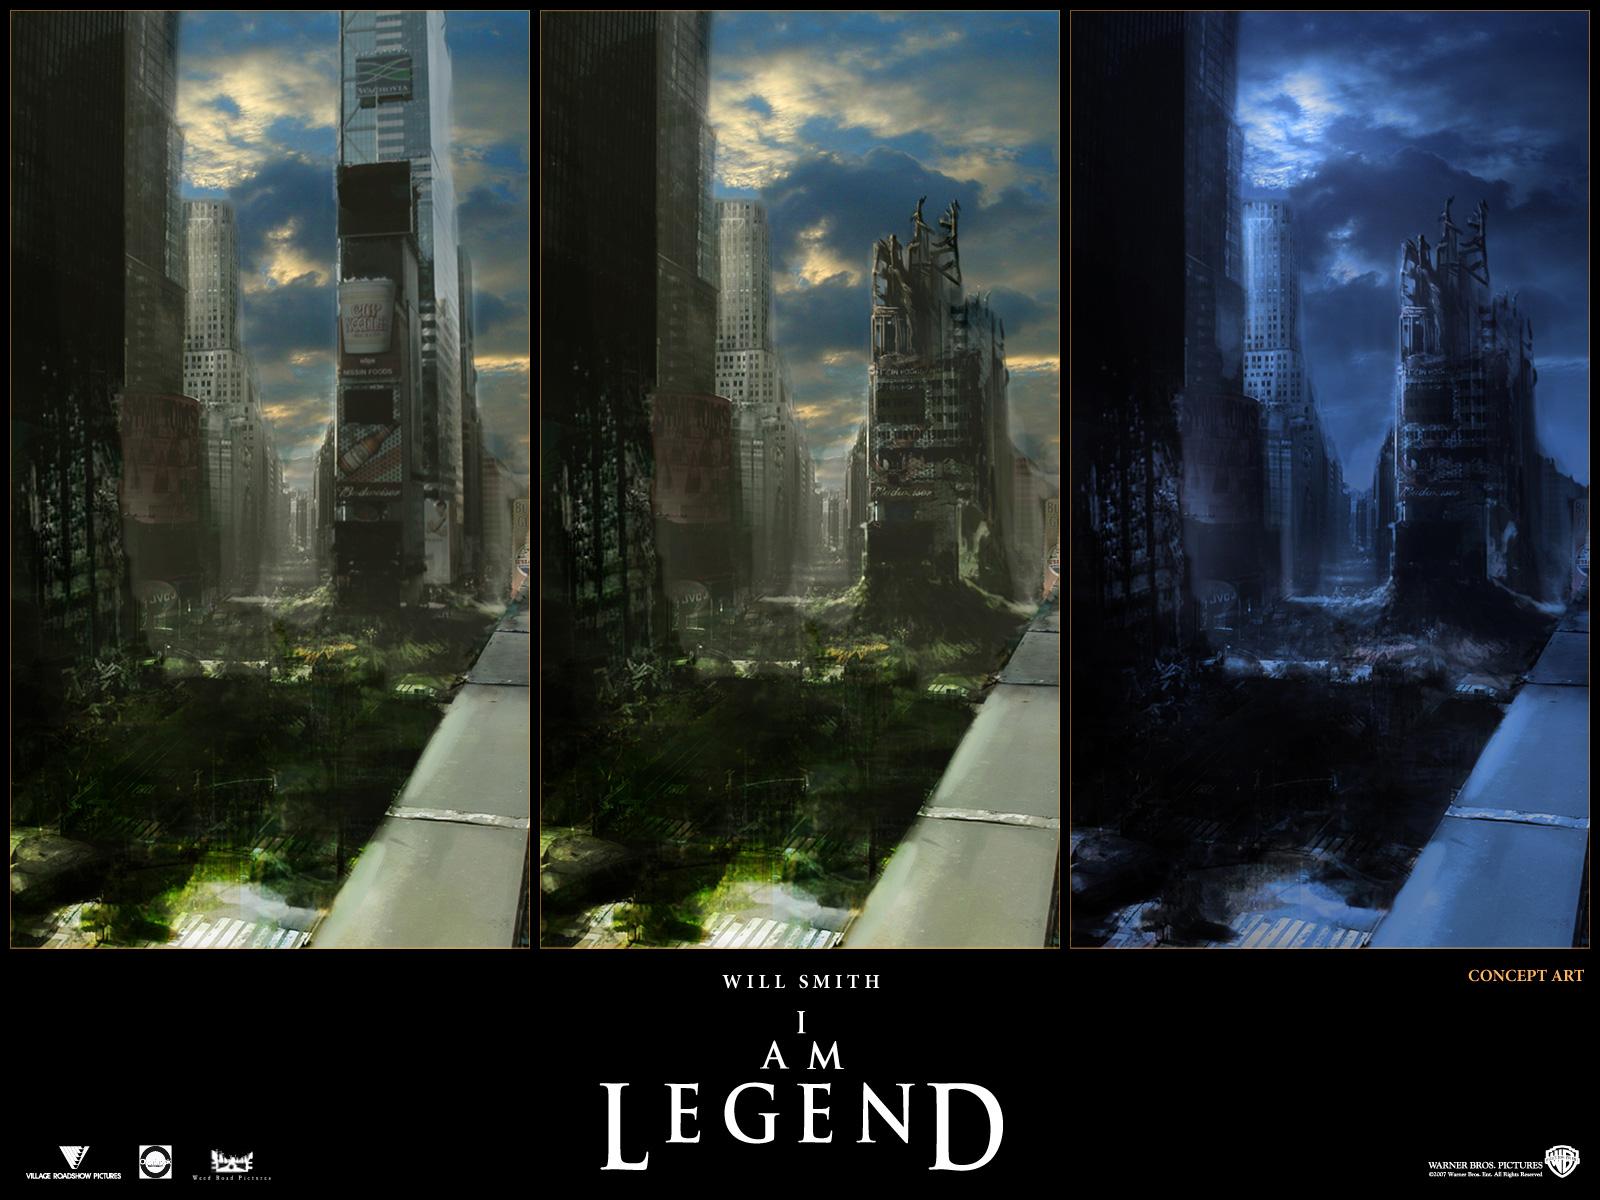 http://2.bp.blogspot.com/_xQxileAA1SU/TU_XqMho6BI/AAAAAAAAC0M/QUUkB3JBMvU/s1600/i-am-legend-wallpapers_7813_1600x1200.jpg